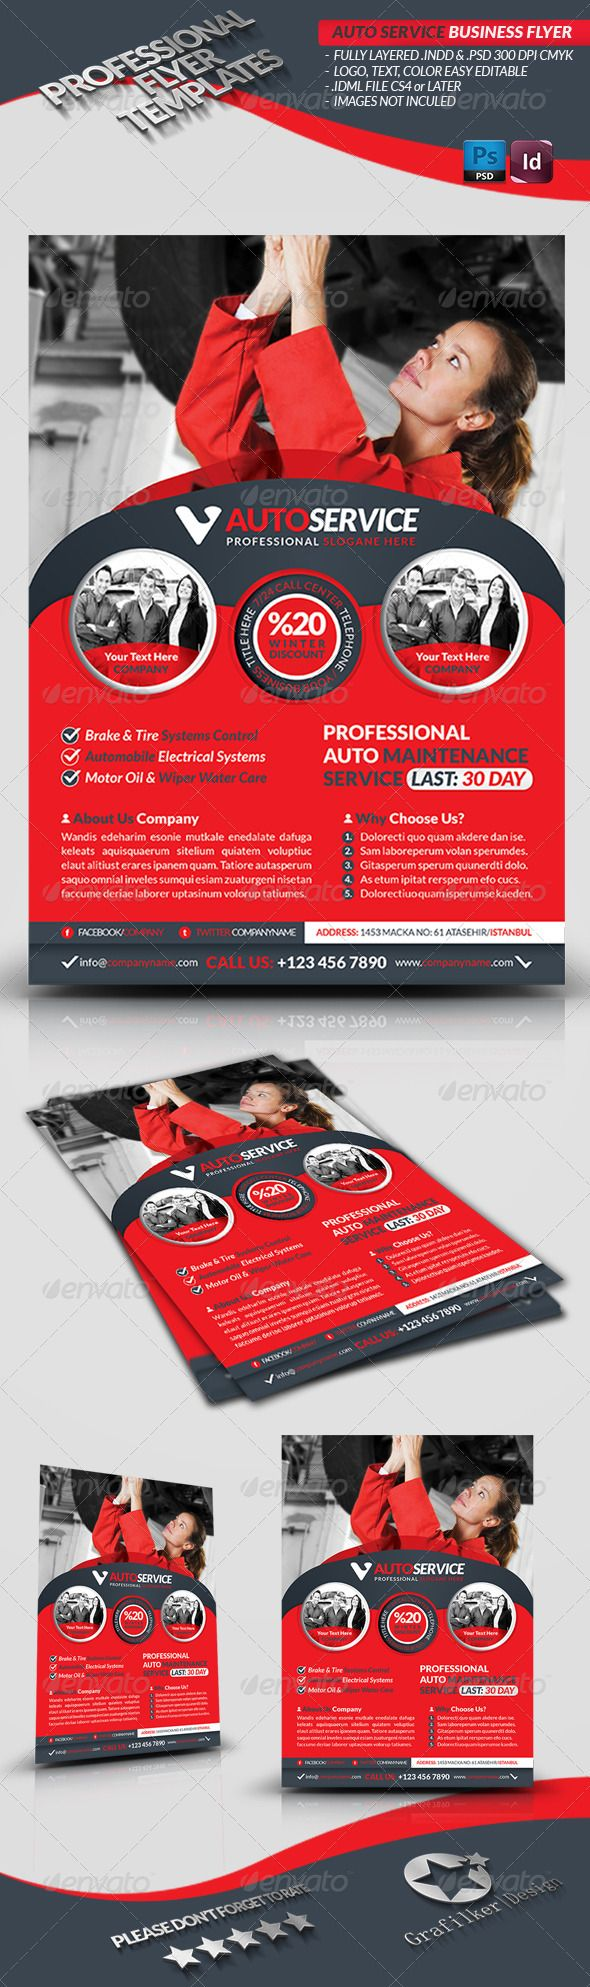 Automobile Service Business Flyer